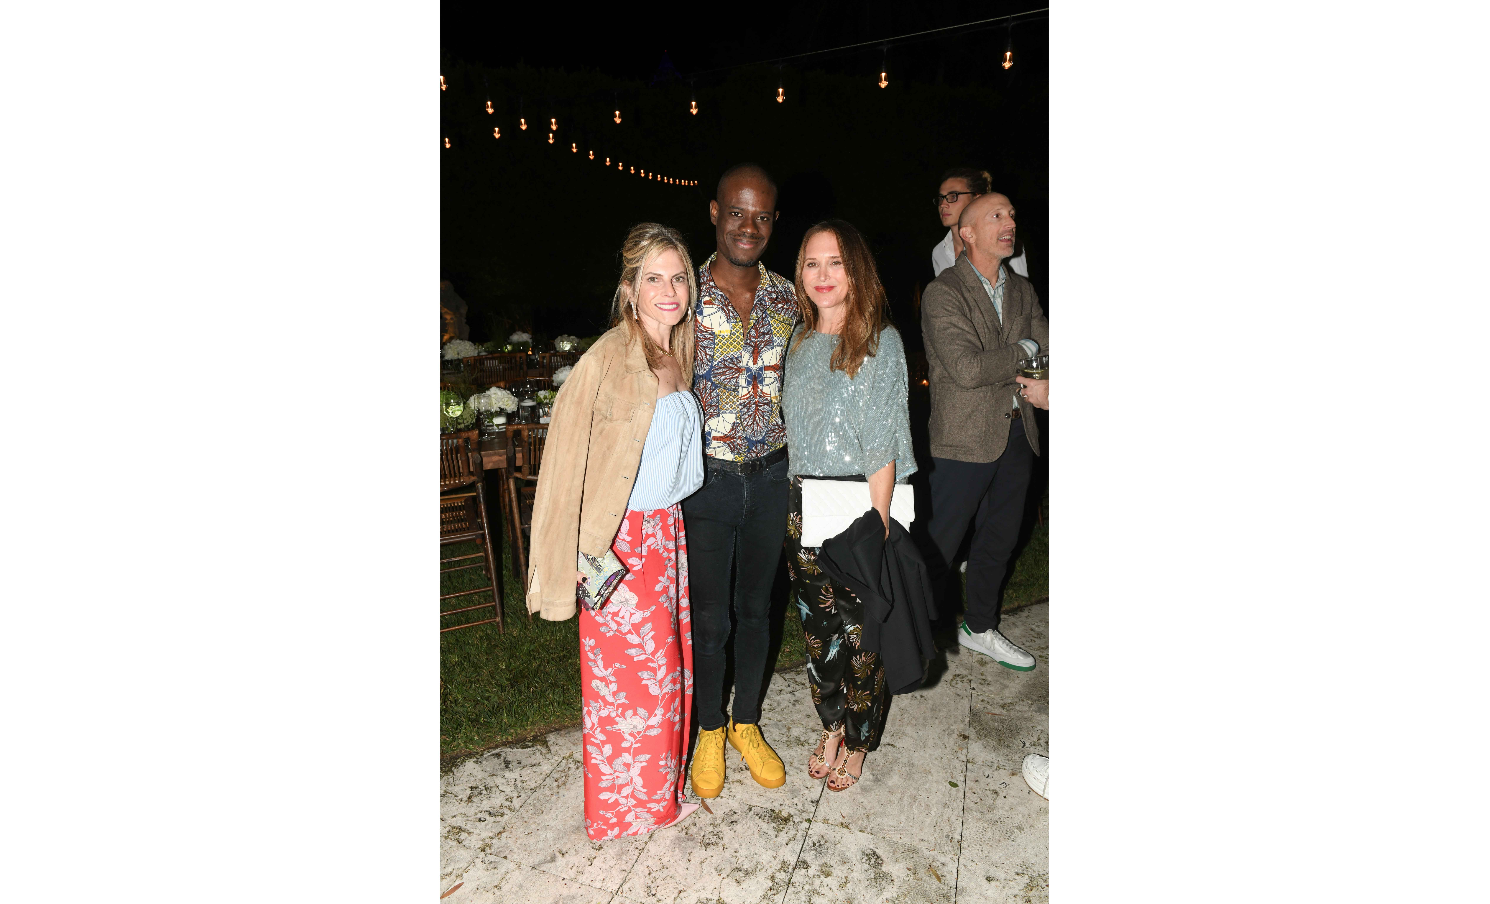 Allison Berg, Diedrick Brackens and Sheryl Amsterdam